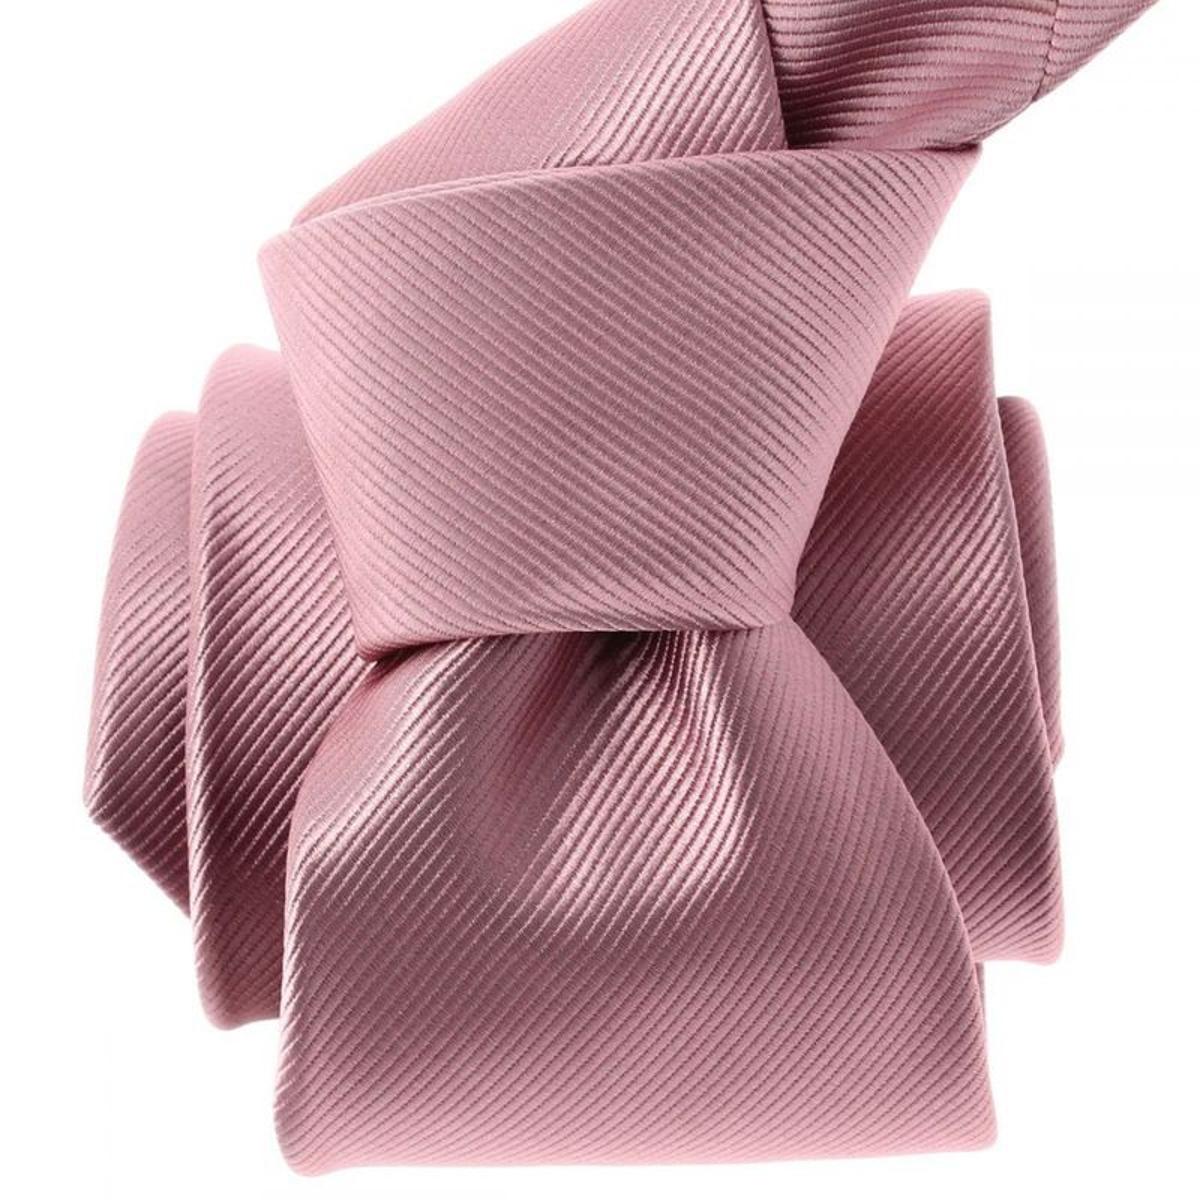 Cravate Deauville. Microfibre Uni